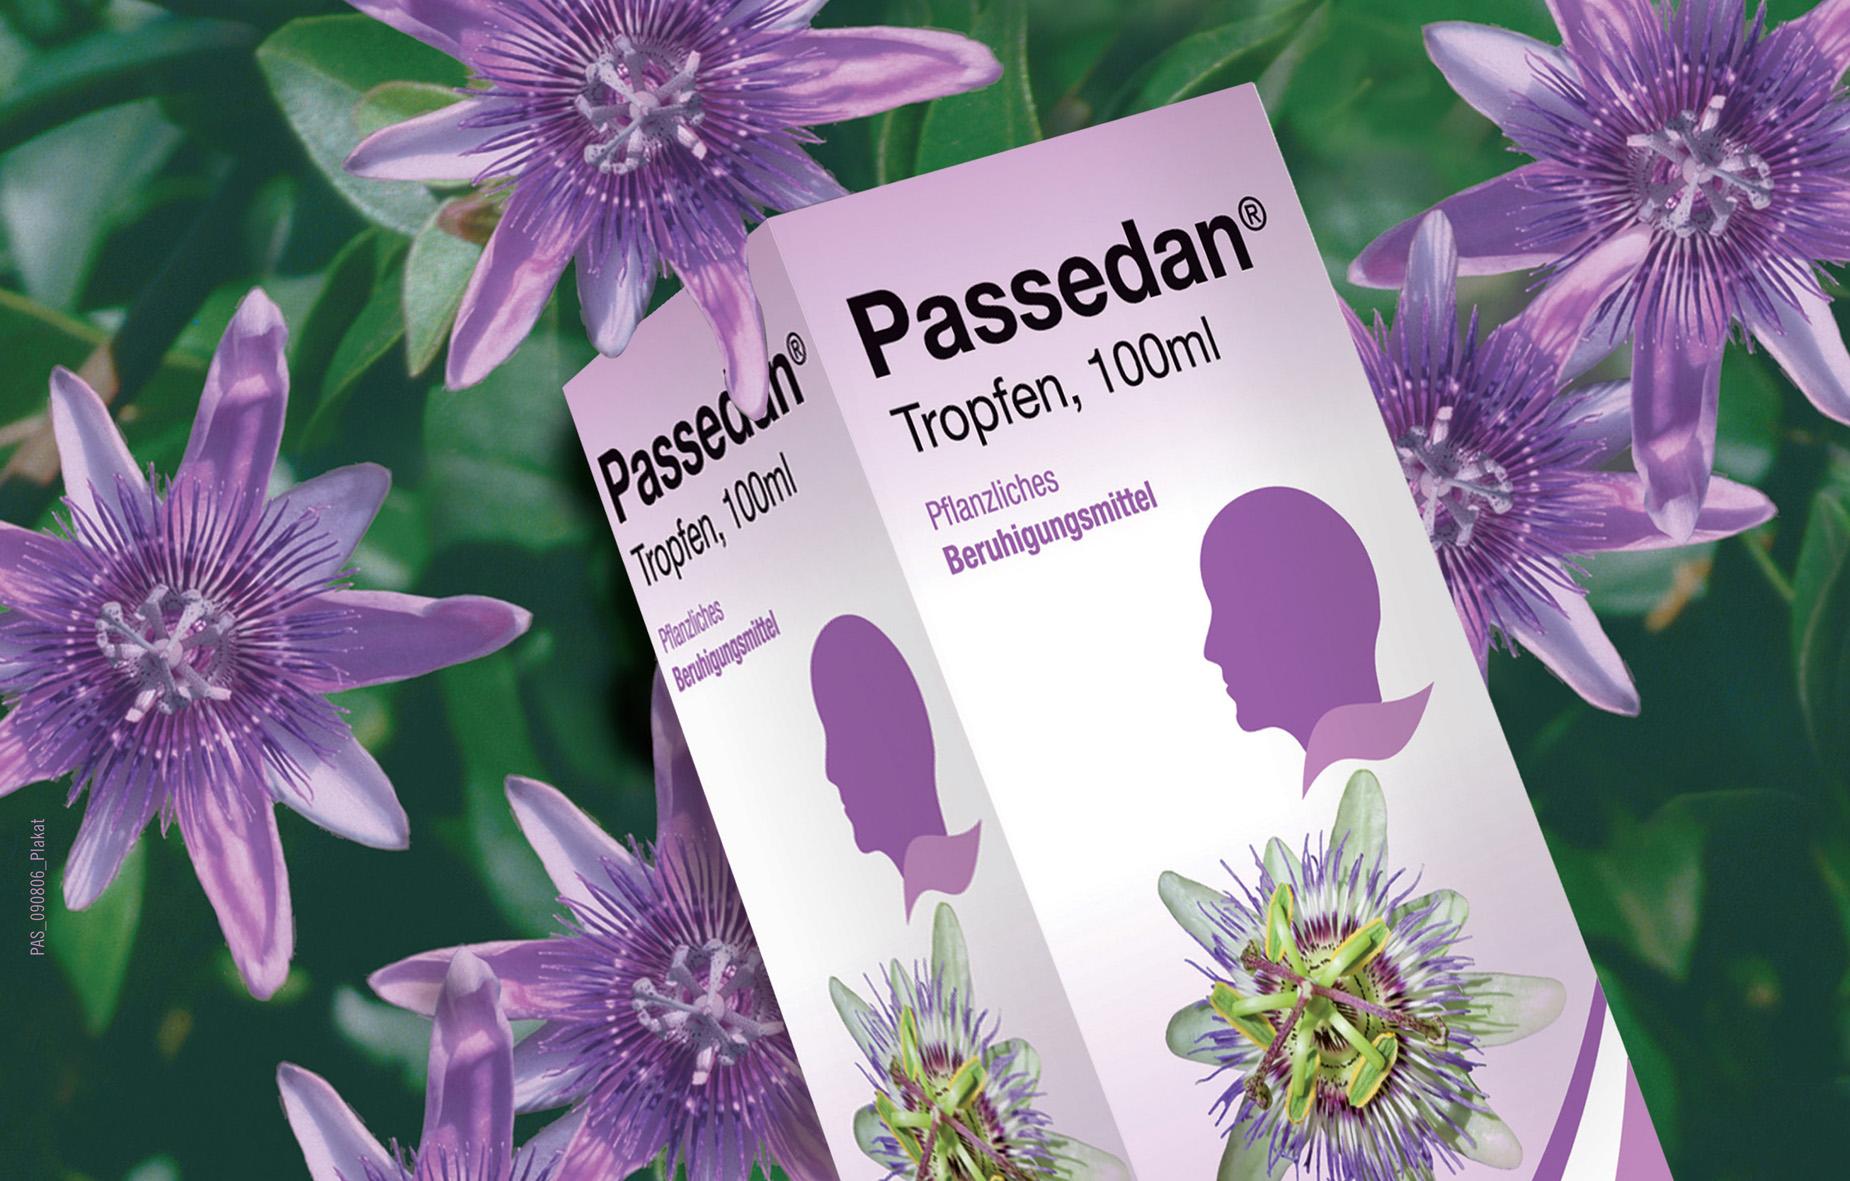 Tropfen passedan Passedan®: Wirkung